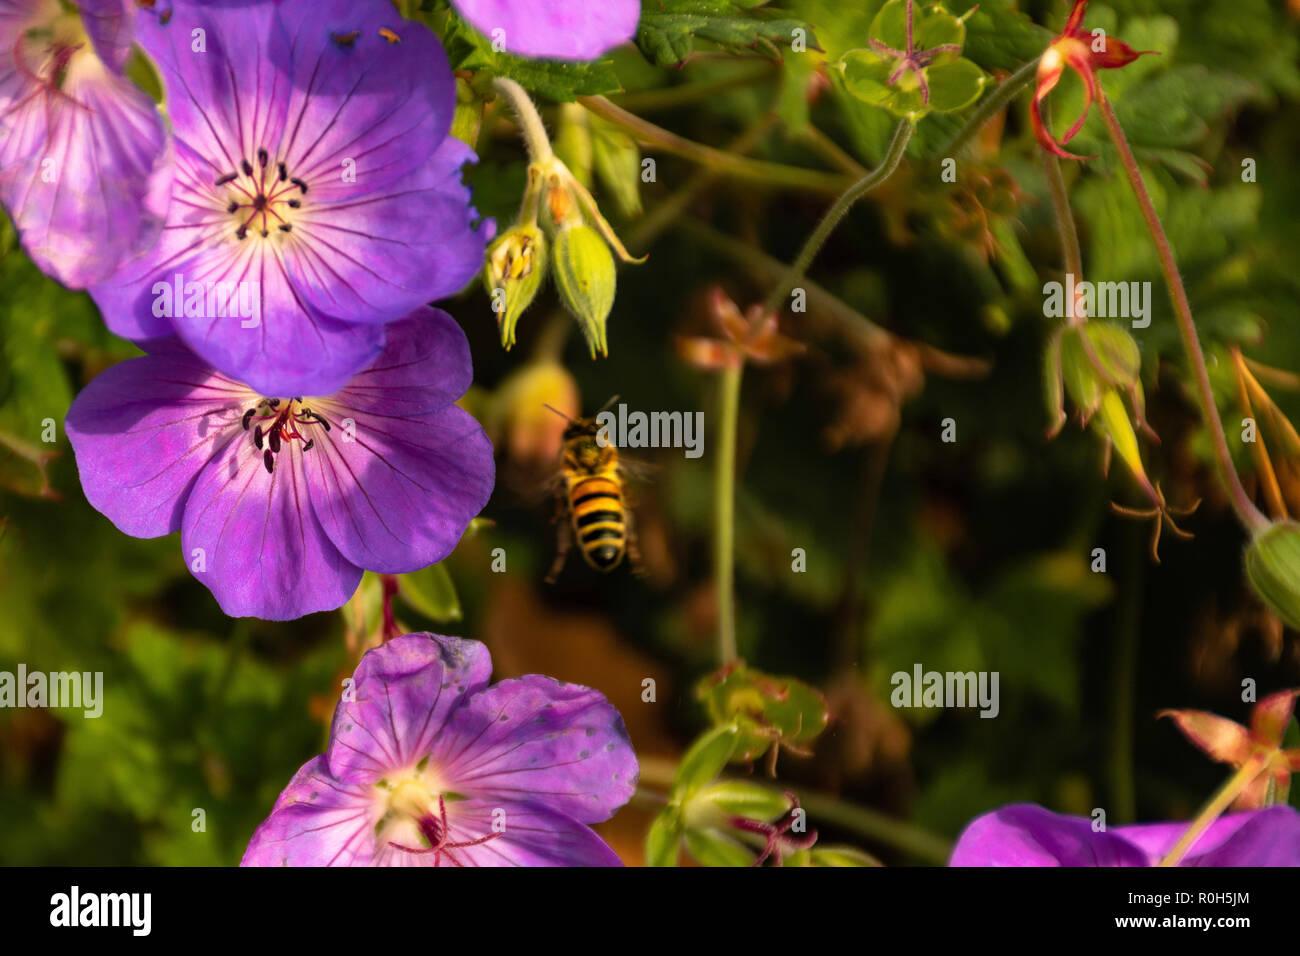 Bee on flower - Api sui fiori - Bienen auf Blumen - Stock Image